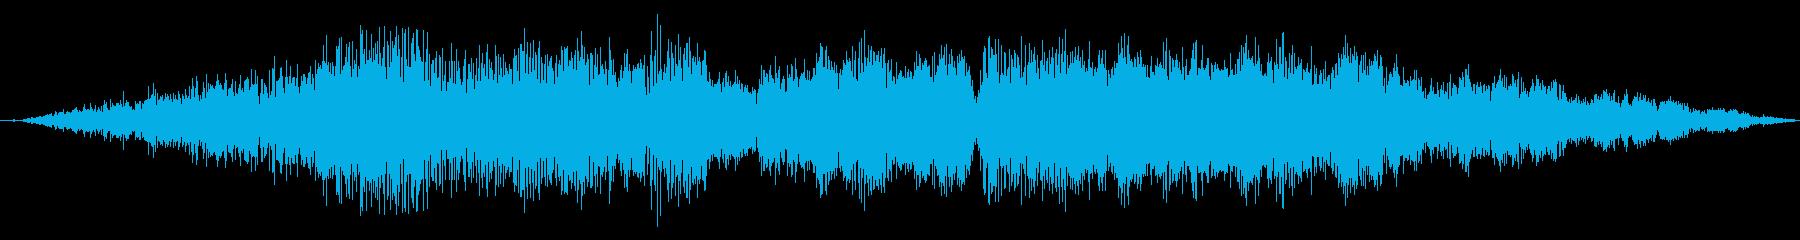 【F1】超ド迫力のF1エンジン効果音9!の再生済みの波形